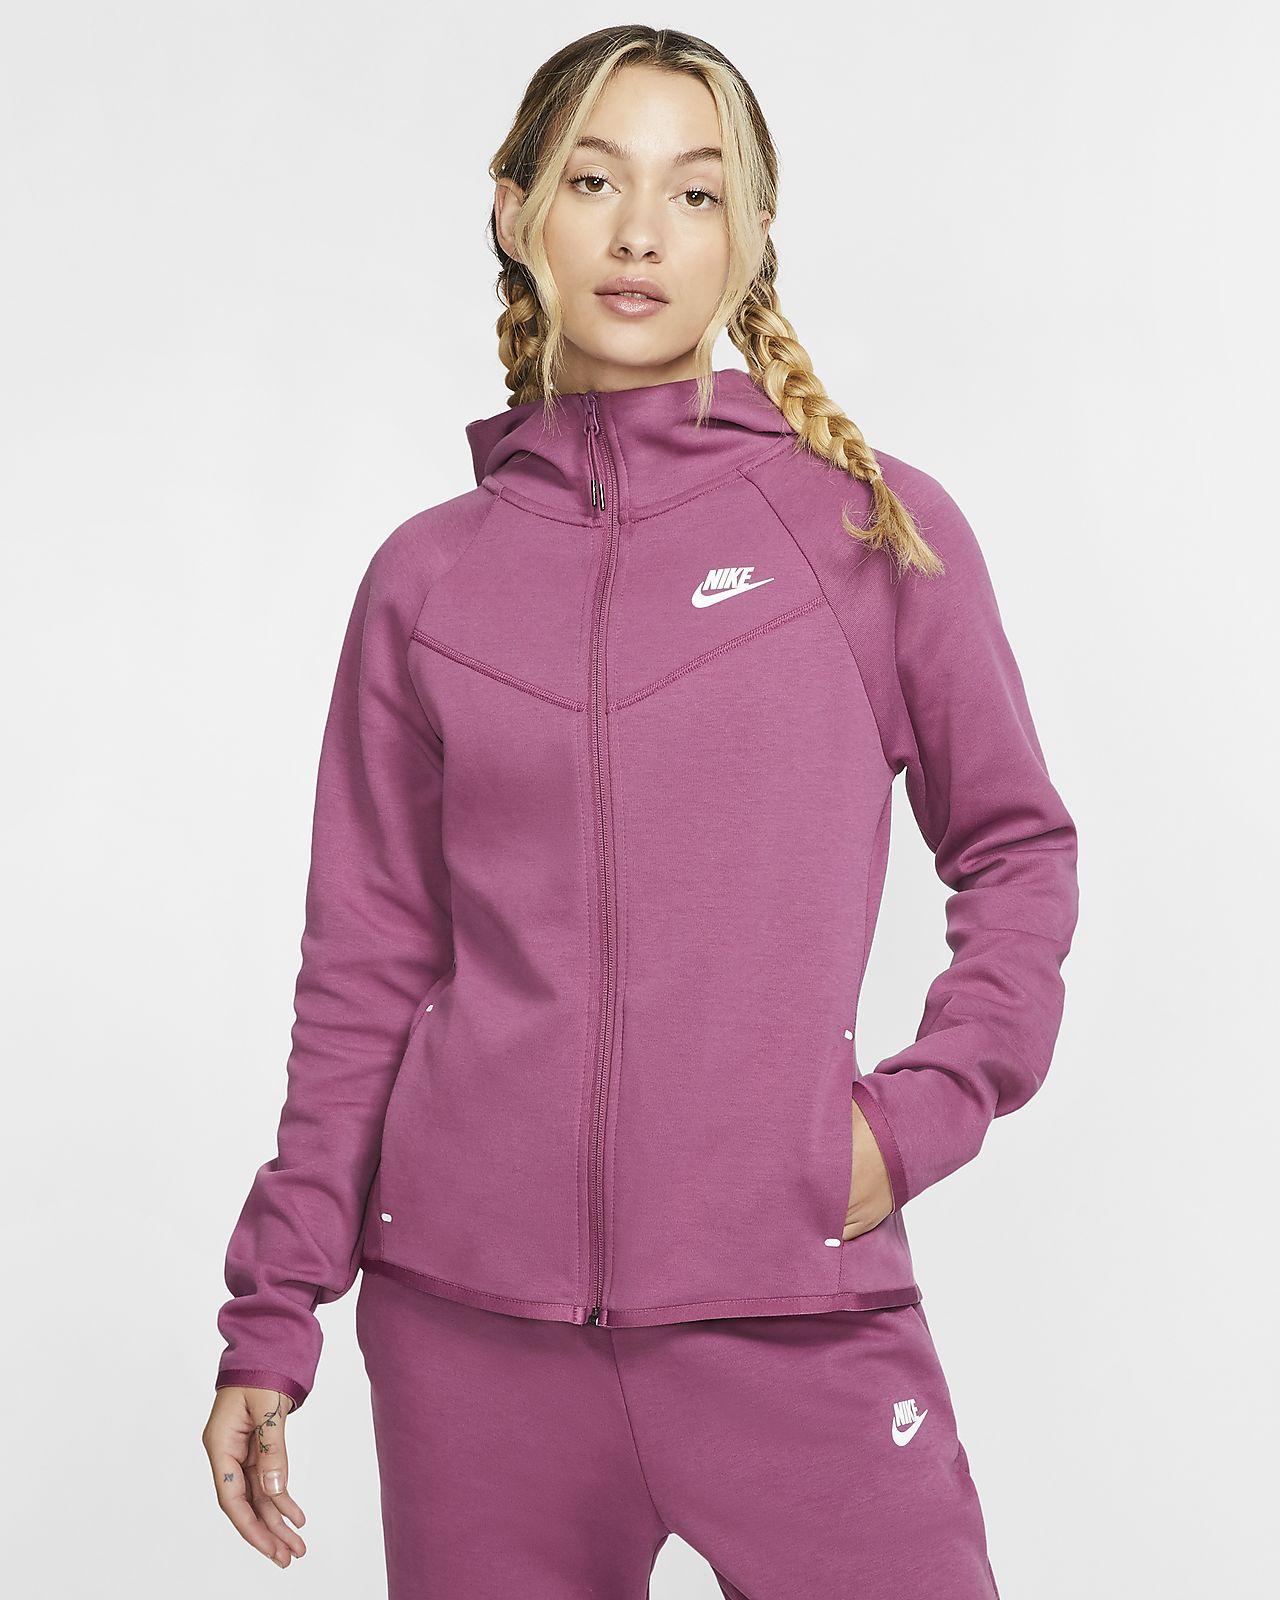 Sudadera con capucha de cierre completo para mujer Nike Sportswear Windrunner Tech Fleece